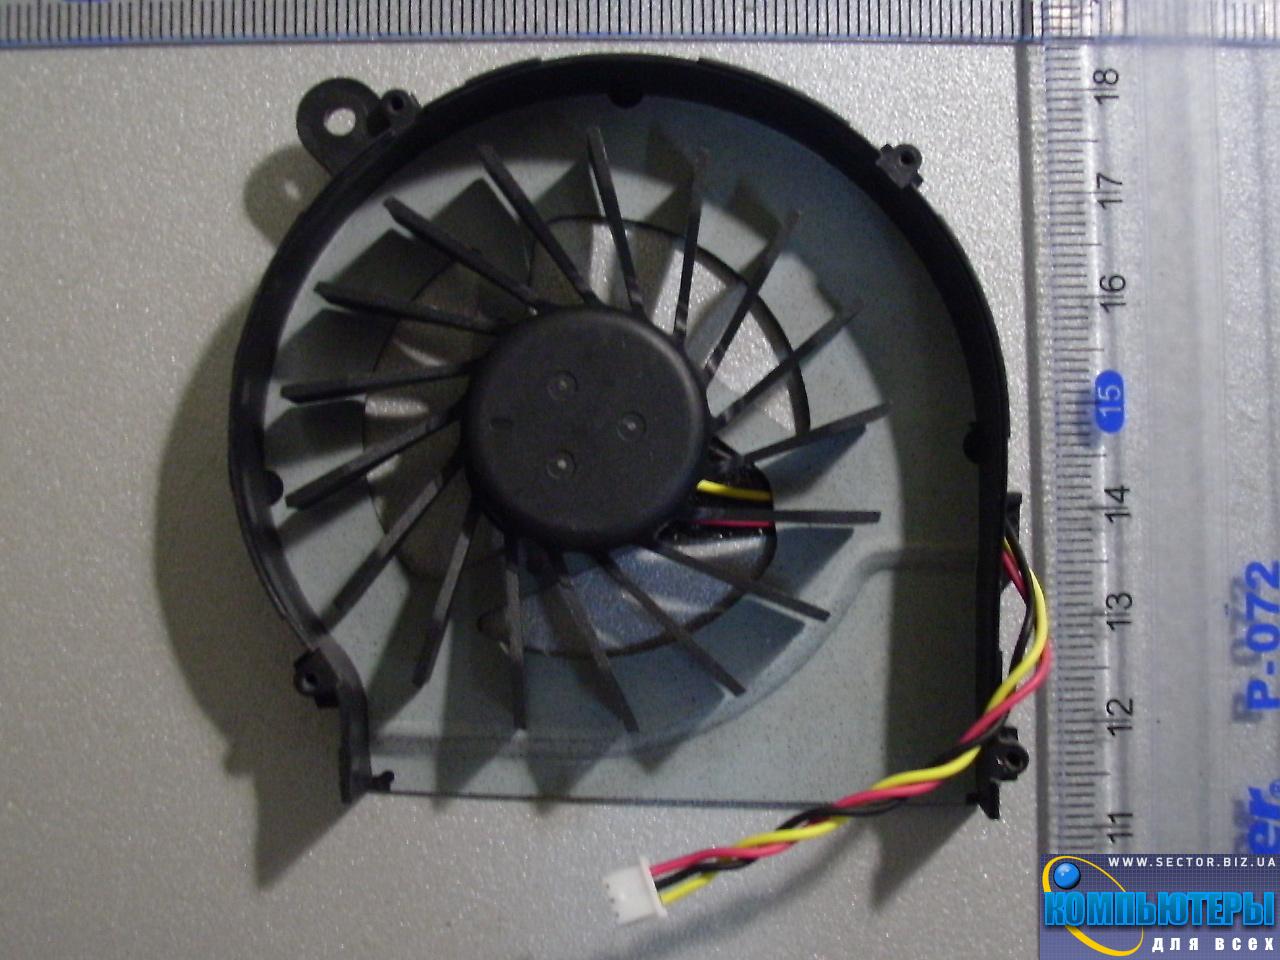 Кулер к ноутбуку HP Compaq CQ42 G42 G4 G6 G7 CQ56 G56 p/n: MF75120V1-C050-S9A. Фото № 5.